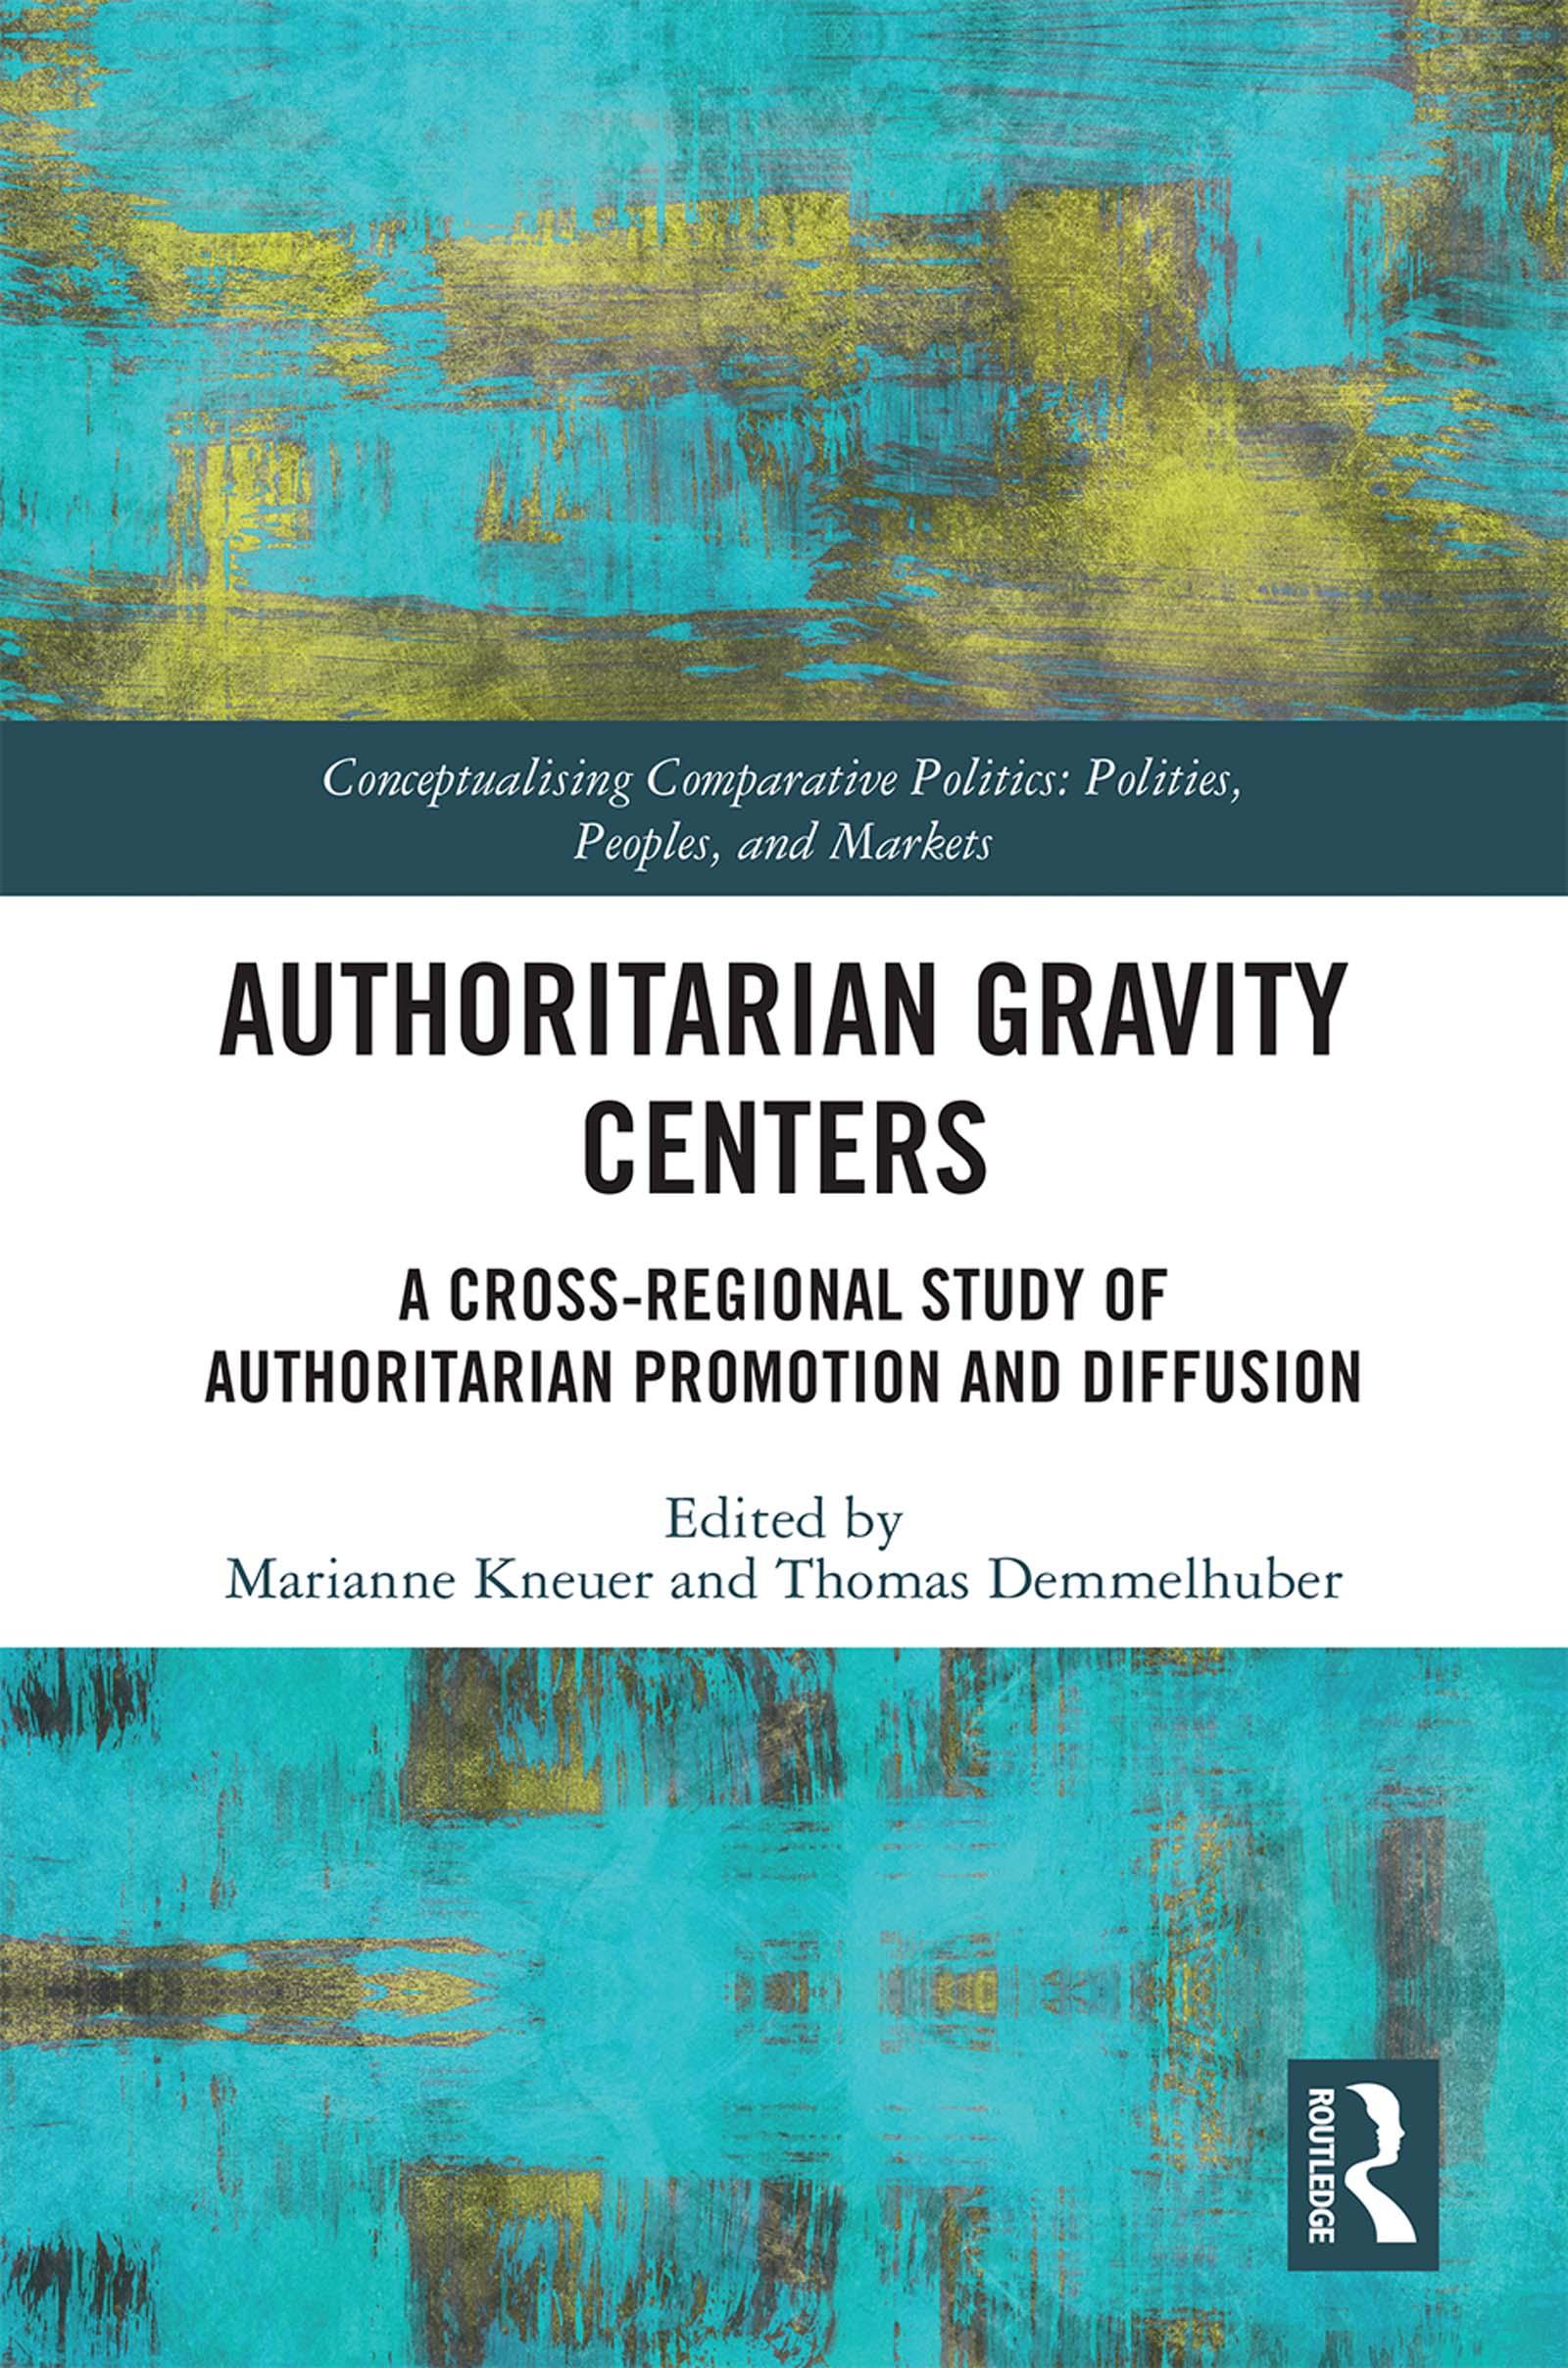 Authoritarian Gravity Centers